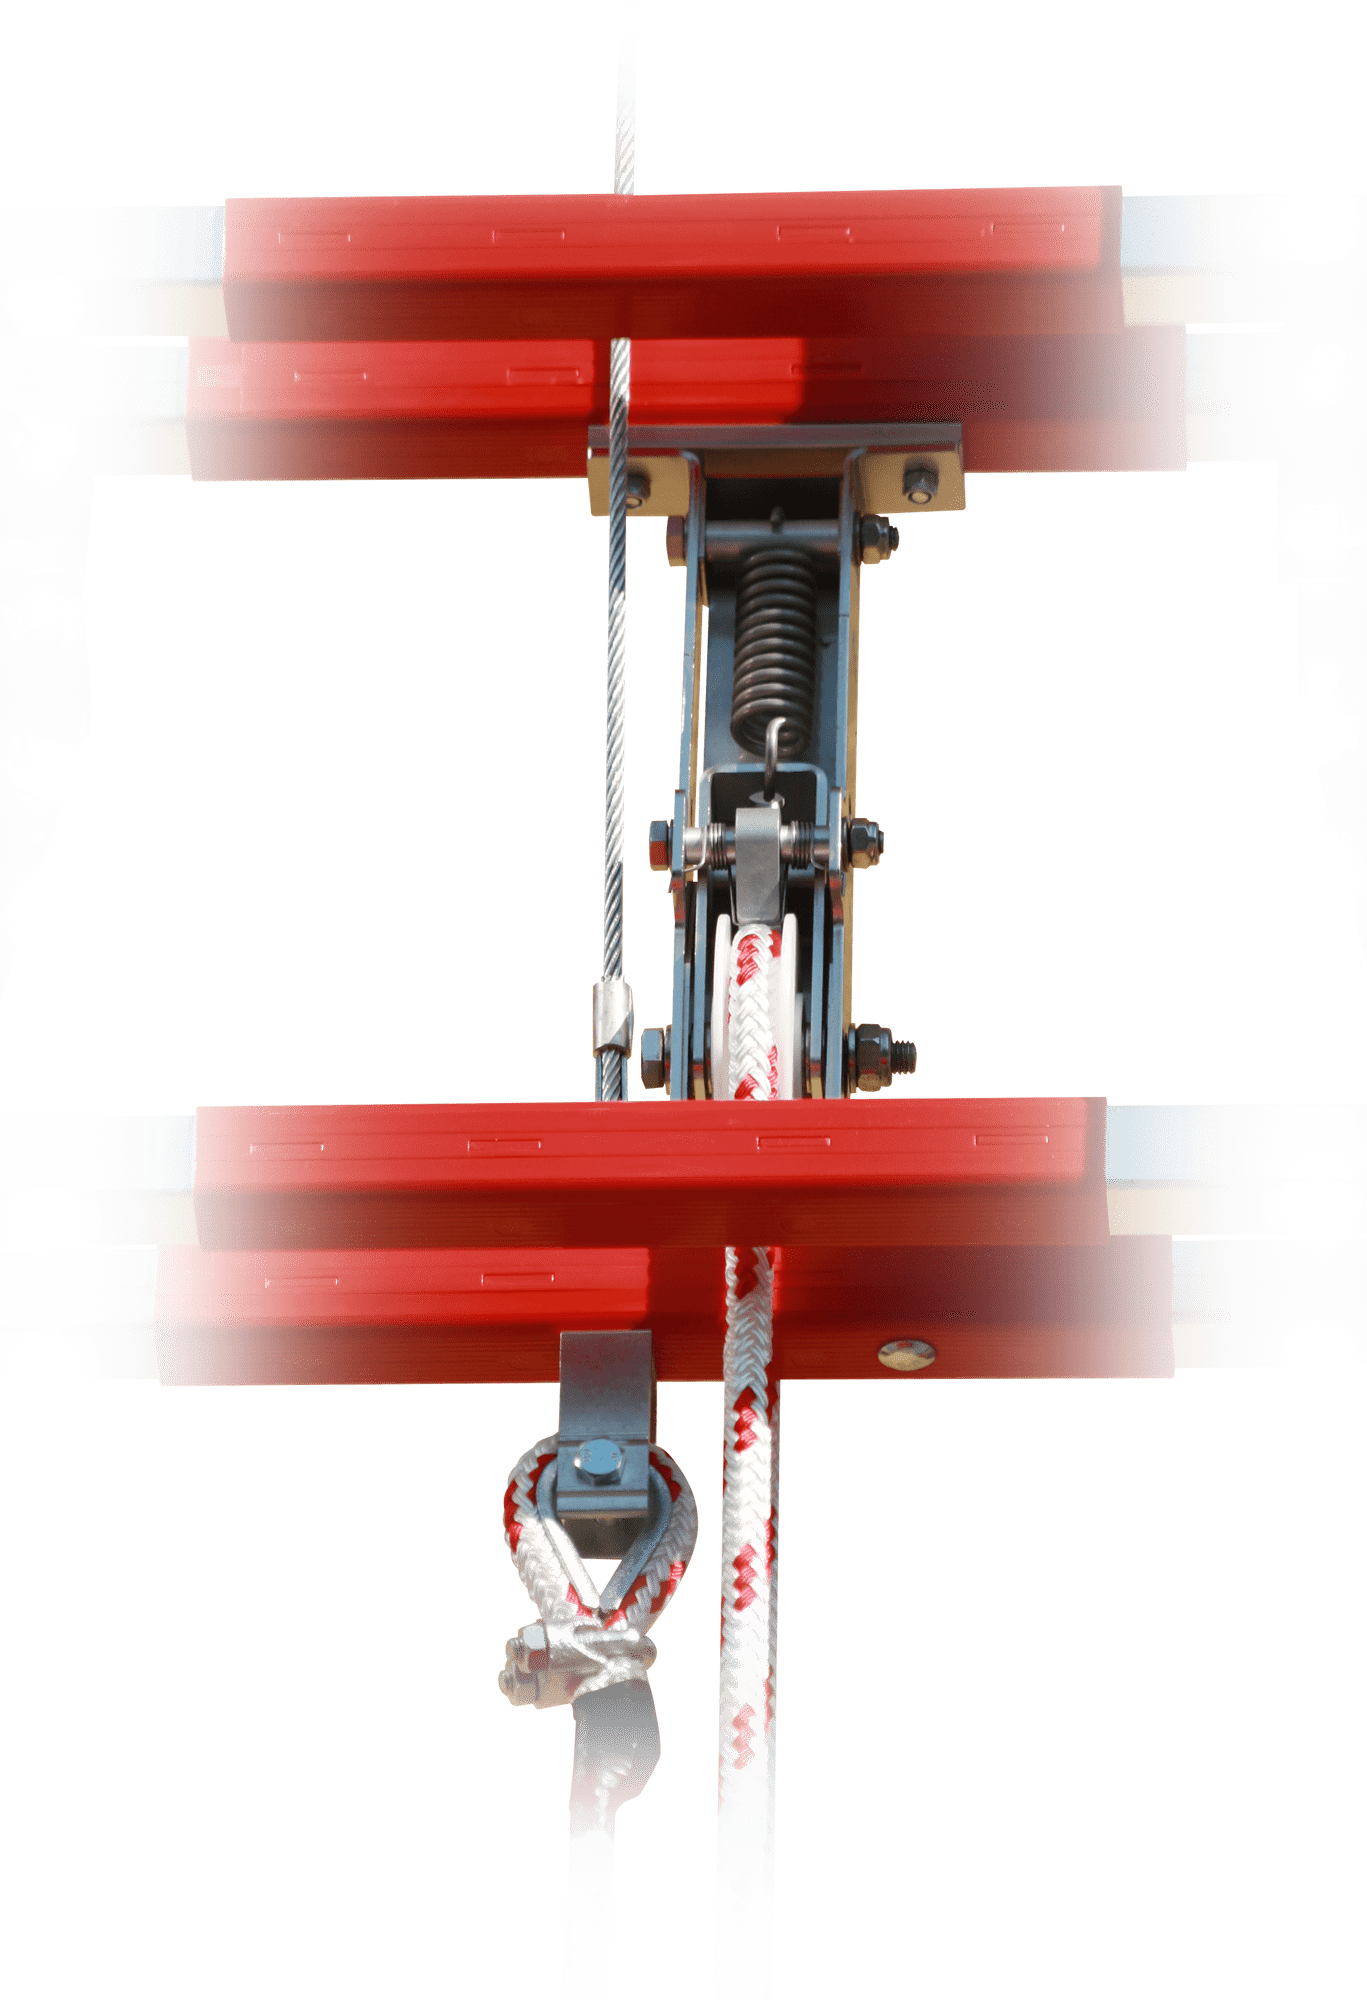 hasičský rebrík detail